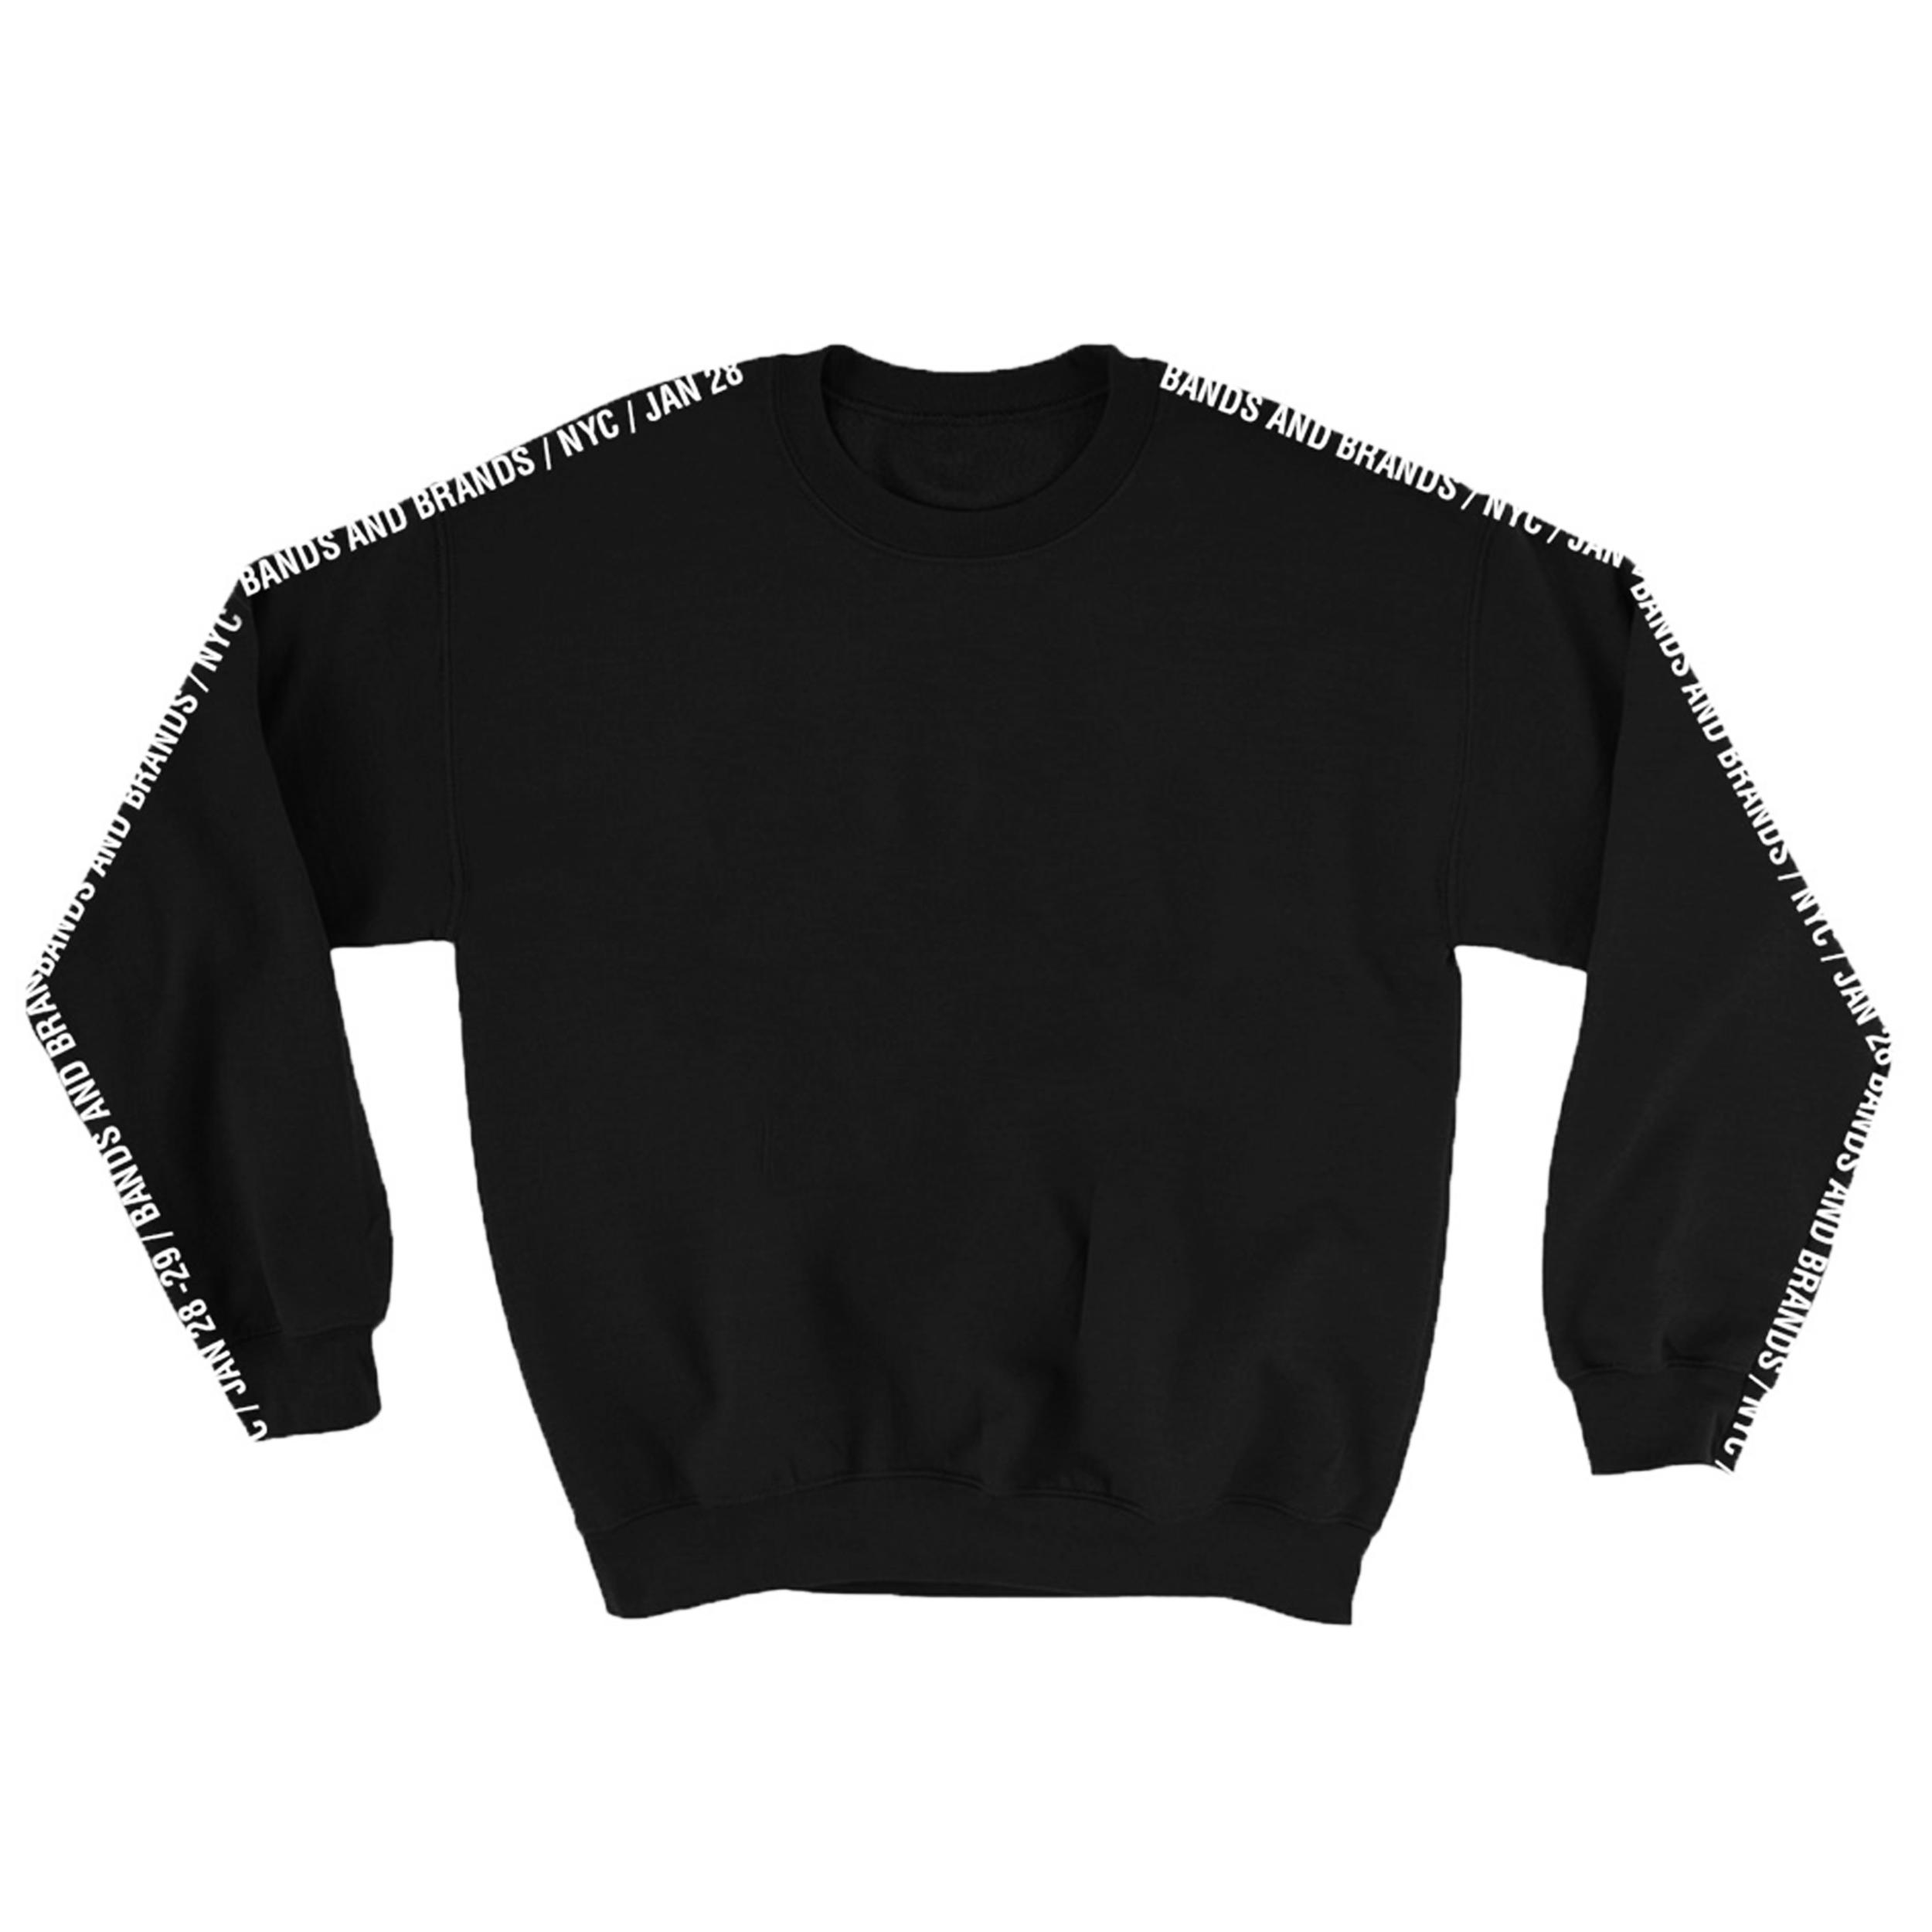 sweatshirt.png